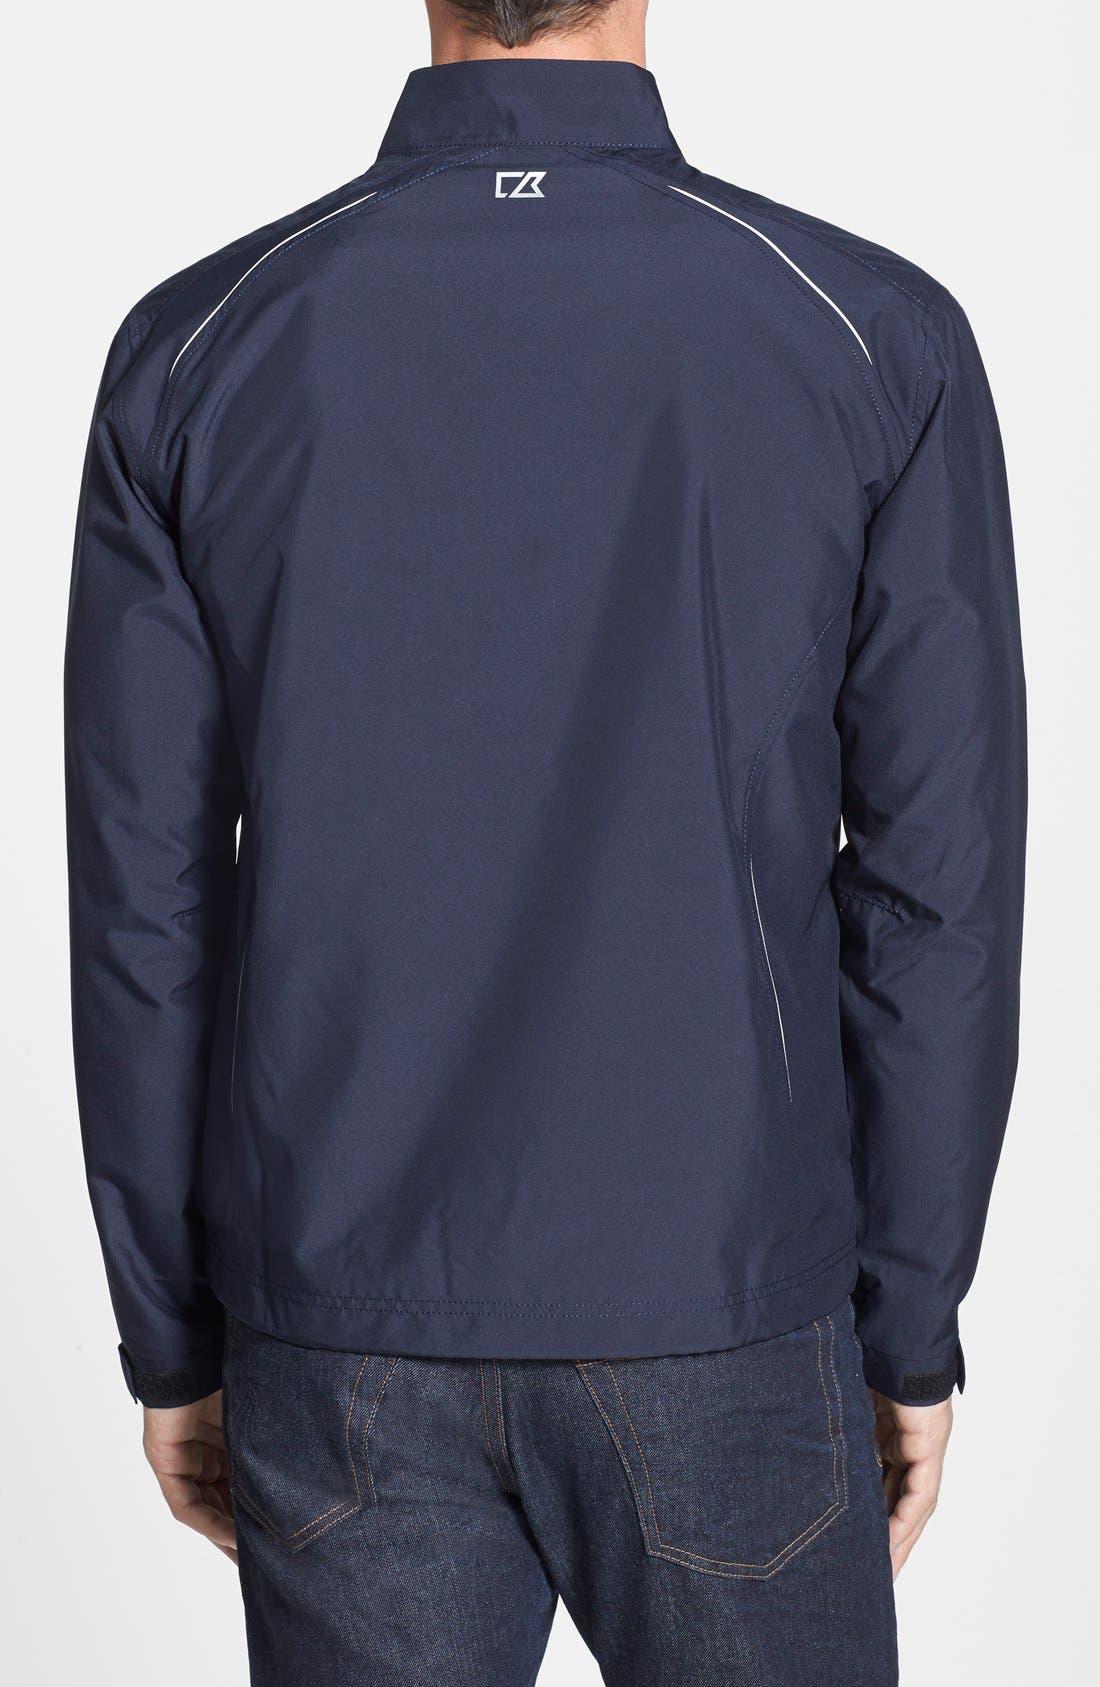 Houston Texans - Beacon WeatherTec Wind & Water Resistant Jacket,                             Alternate thumbnail 2, color,                             420